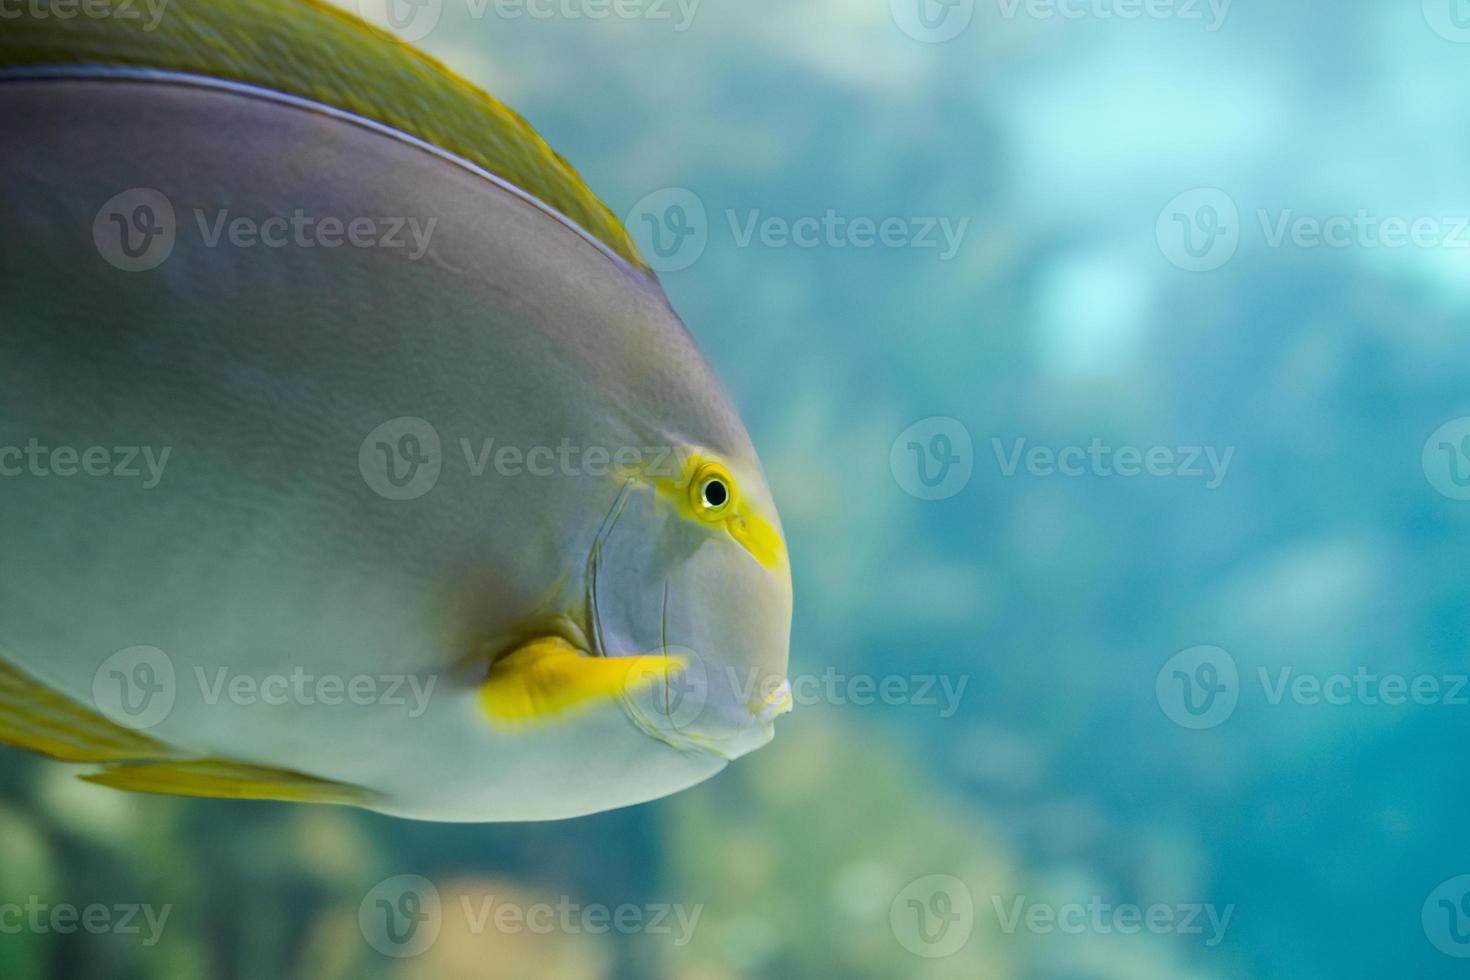 Colorful Tropical Hawaiian Pacific Fish in Aquarium Exhibit photo